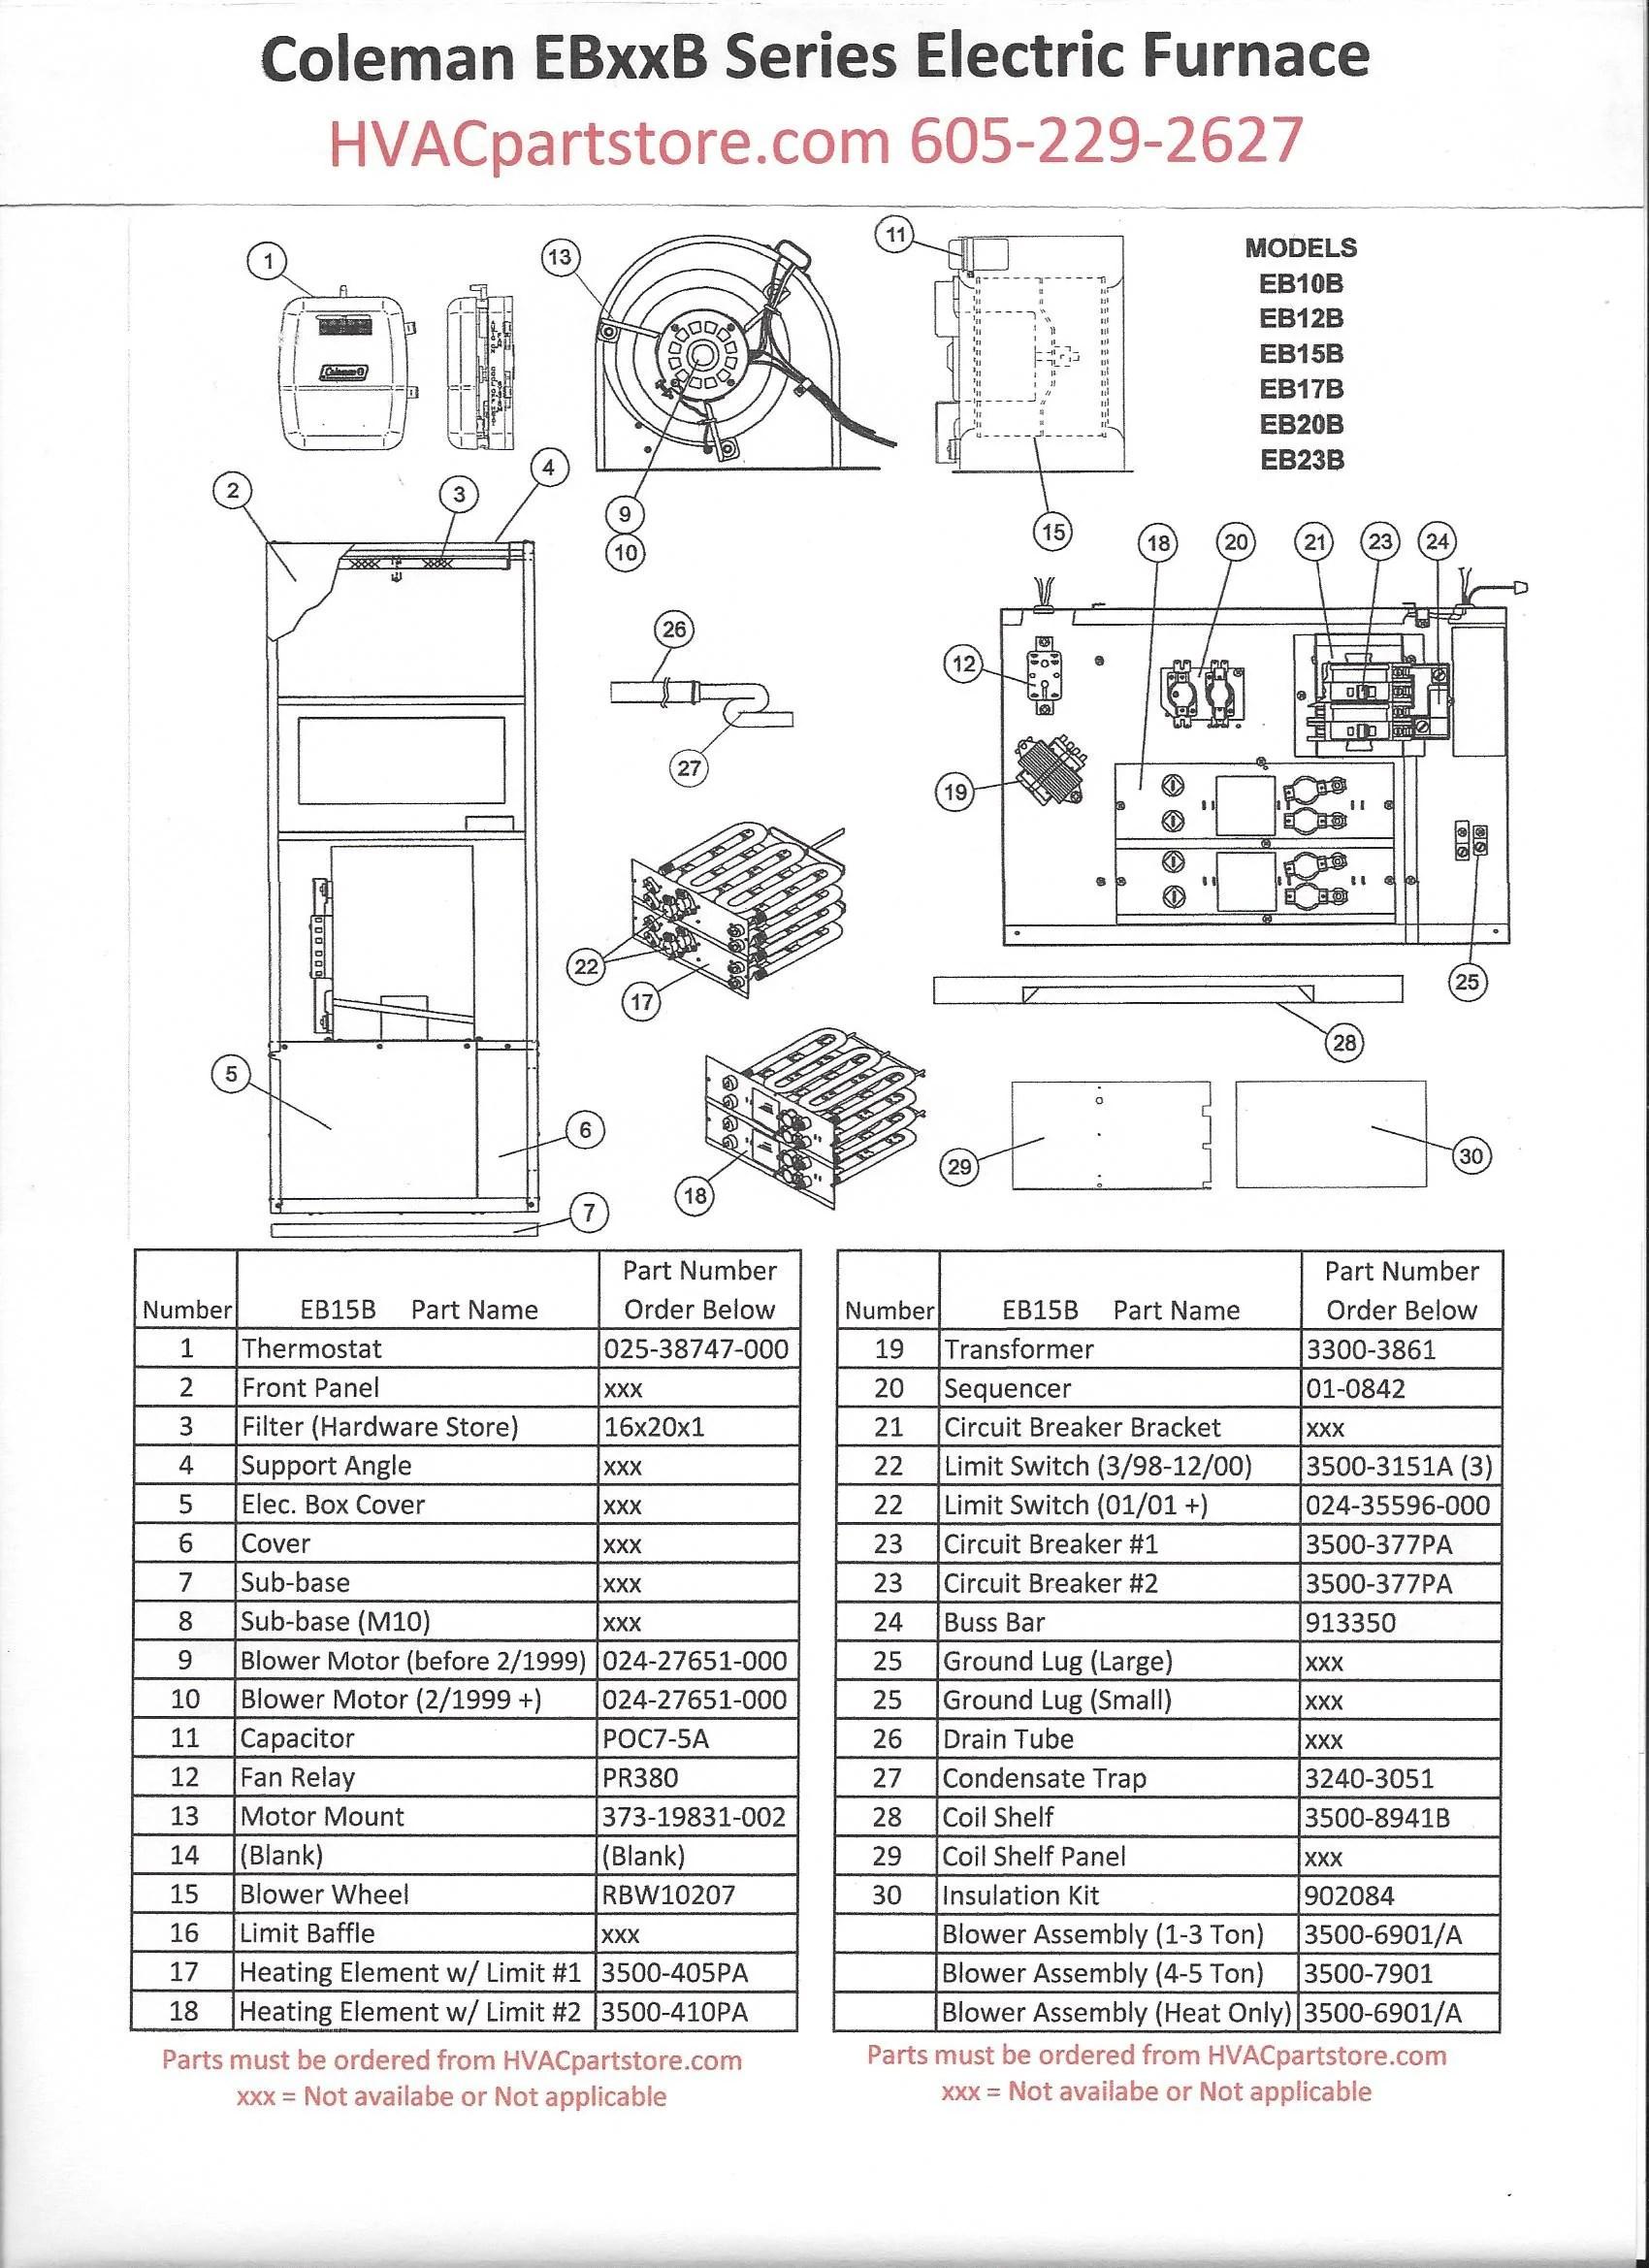 EB15B Coleman Electric Furnace Parts – HVACpartstore